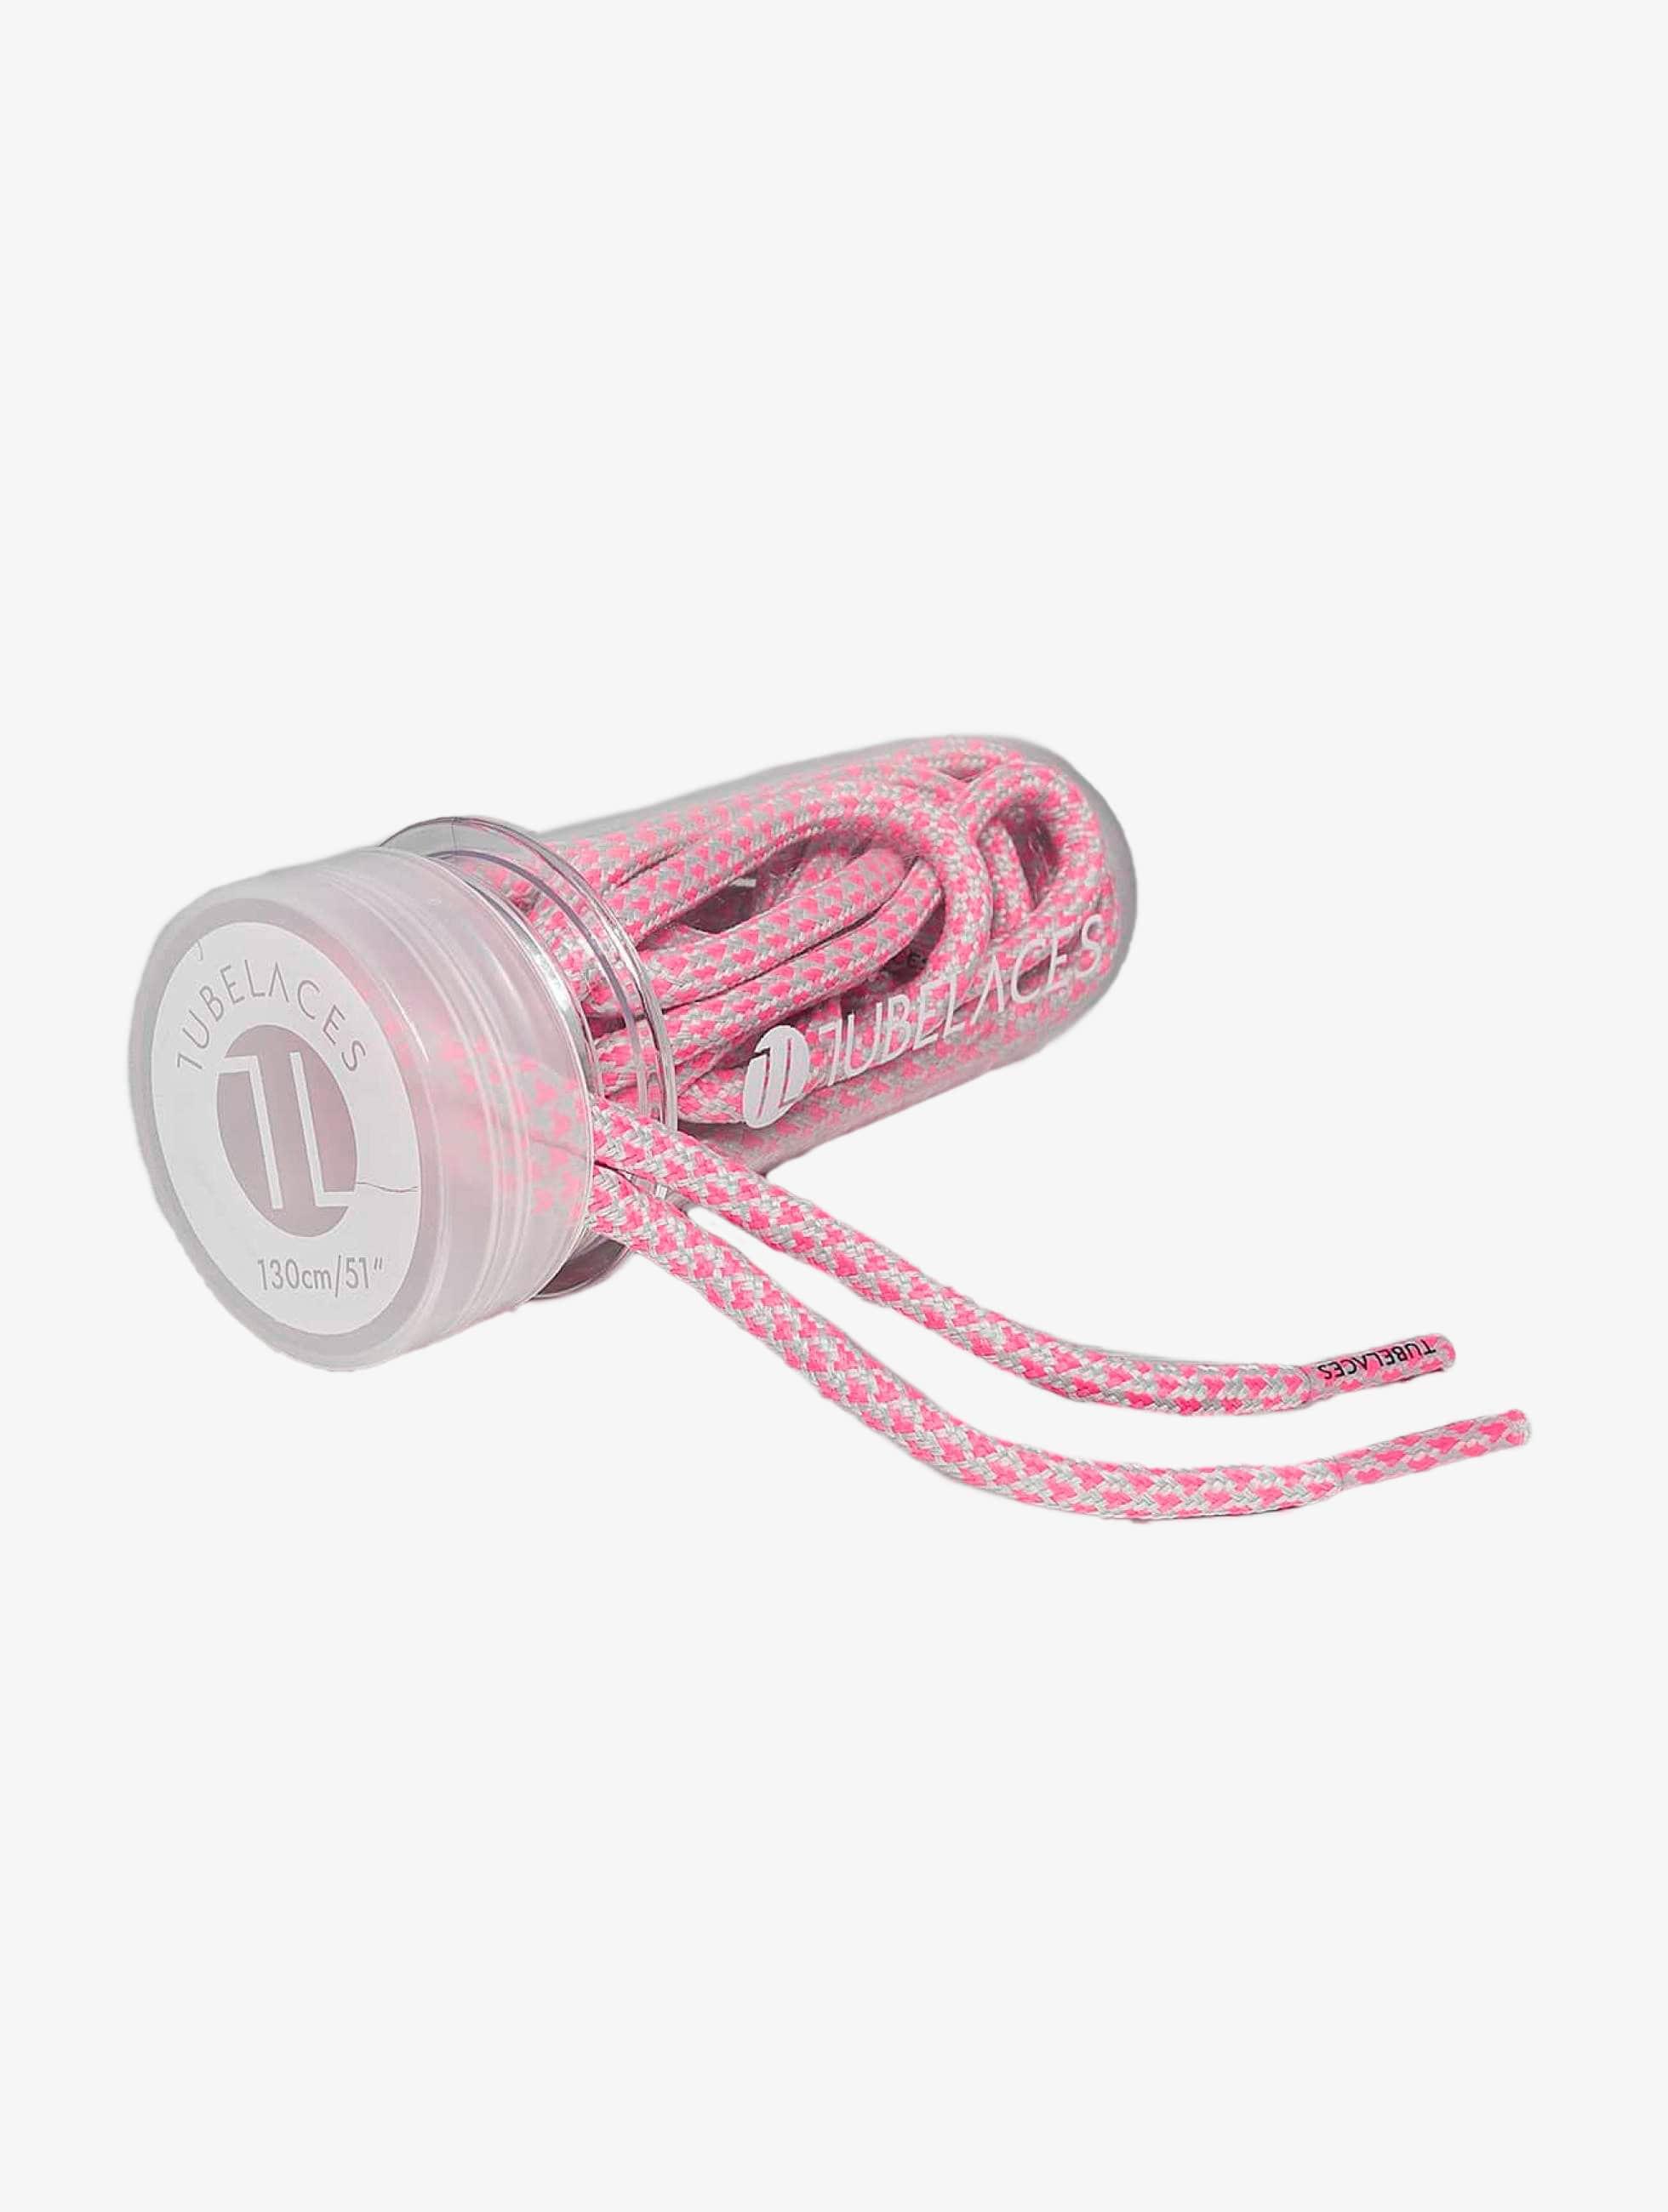 Tubelaces Аксессуар для обуви Rope Multi лаванда